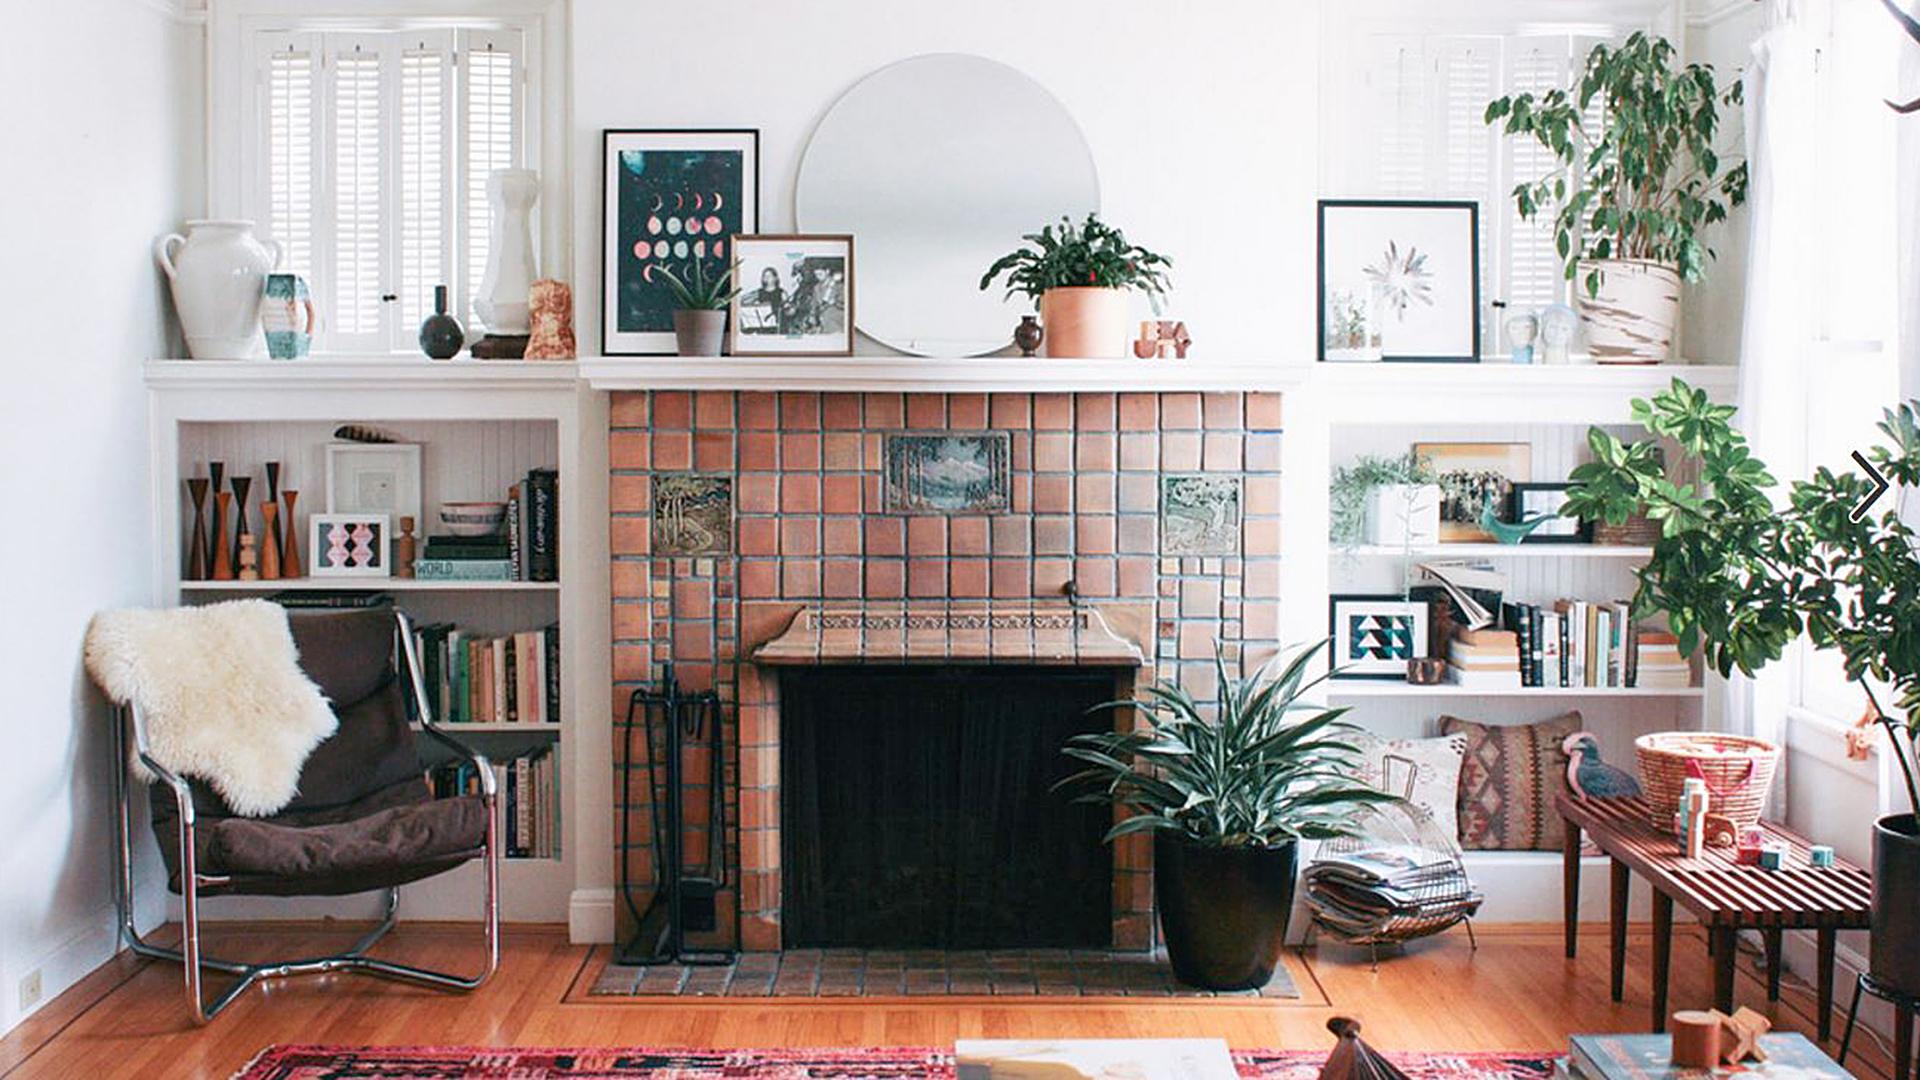 7 easy houseplants for an east-facing window Spidar Plant Norfolk Pine House on